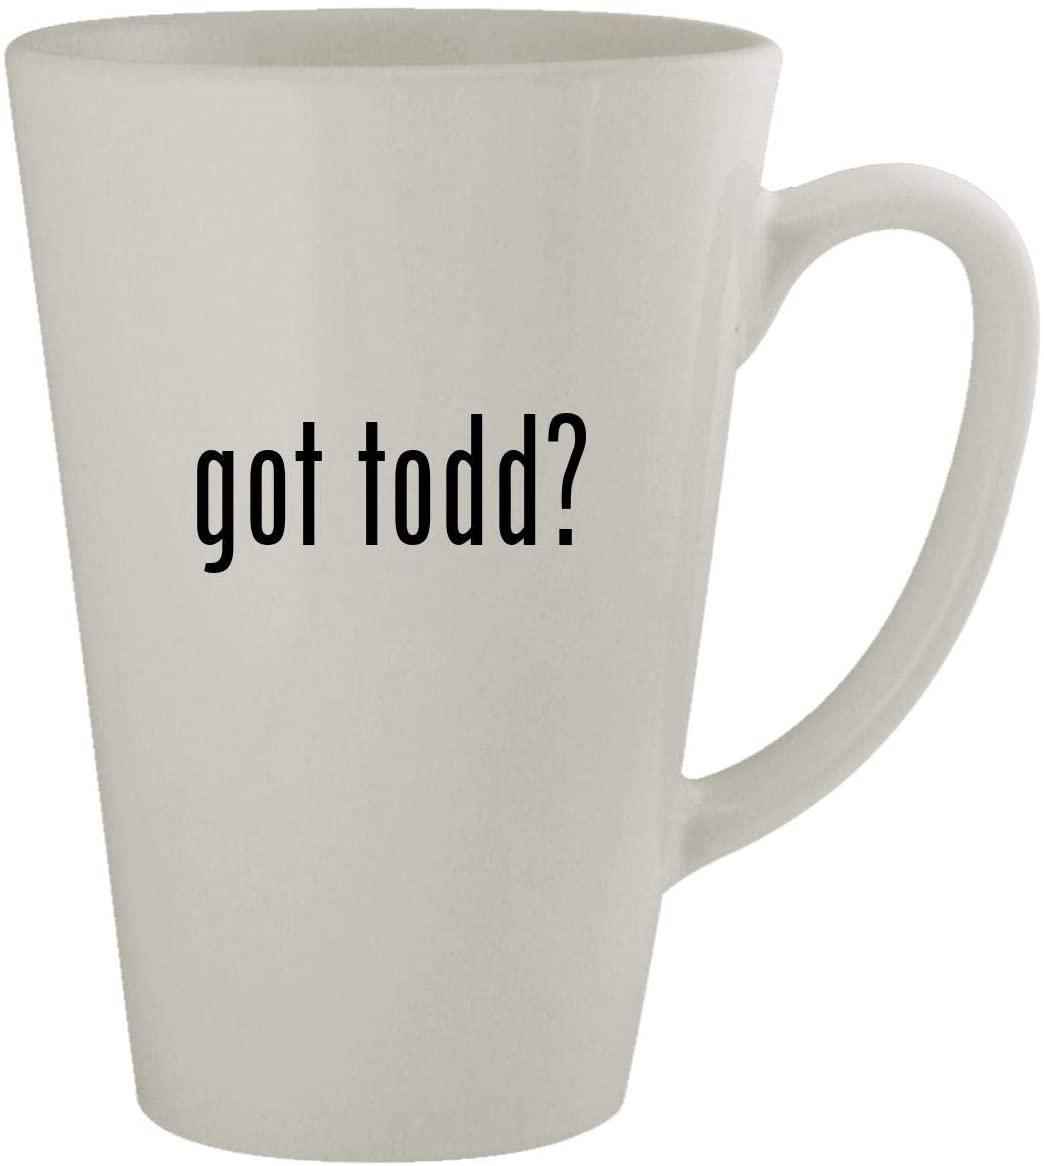 got todd? - 17oz Latte Coffee Mug Cup